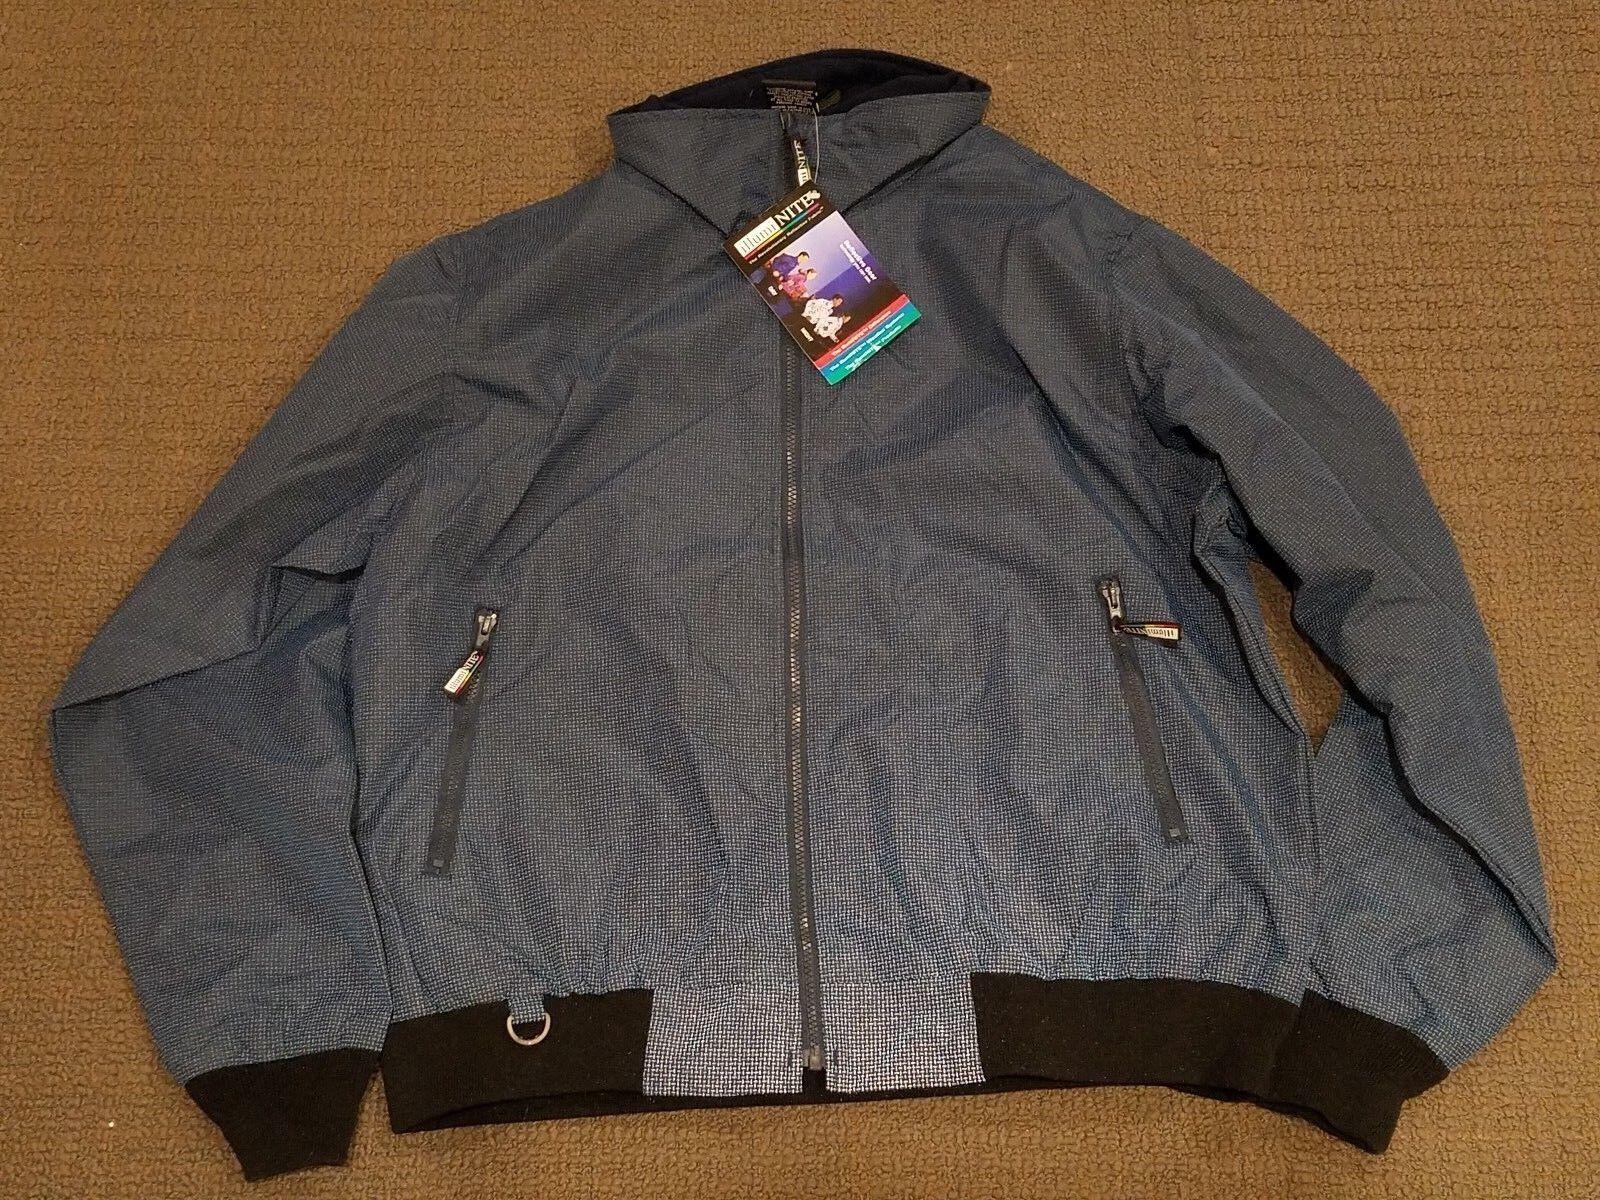 Ambu Illuminite Mens Fully Reflective Full Zip Lightweight Jacket Coat Blue